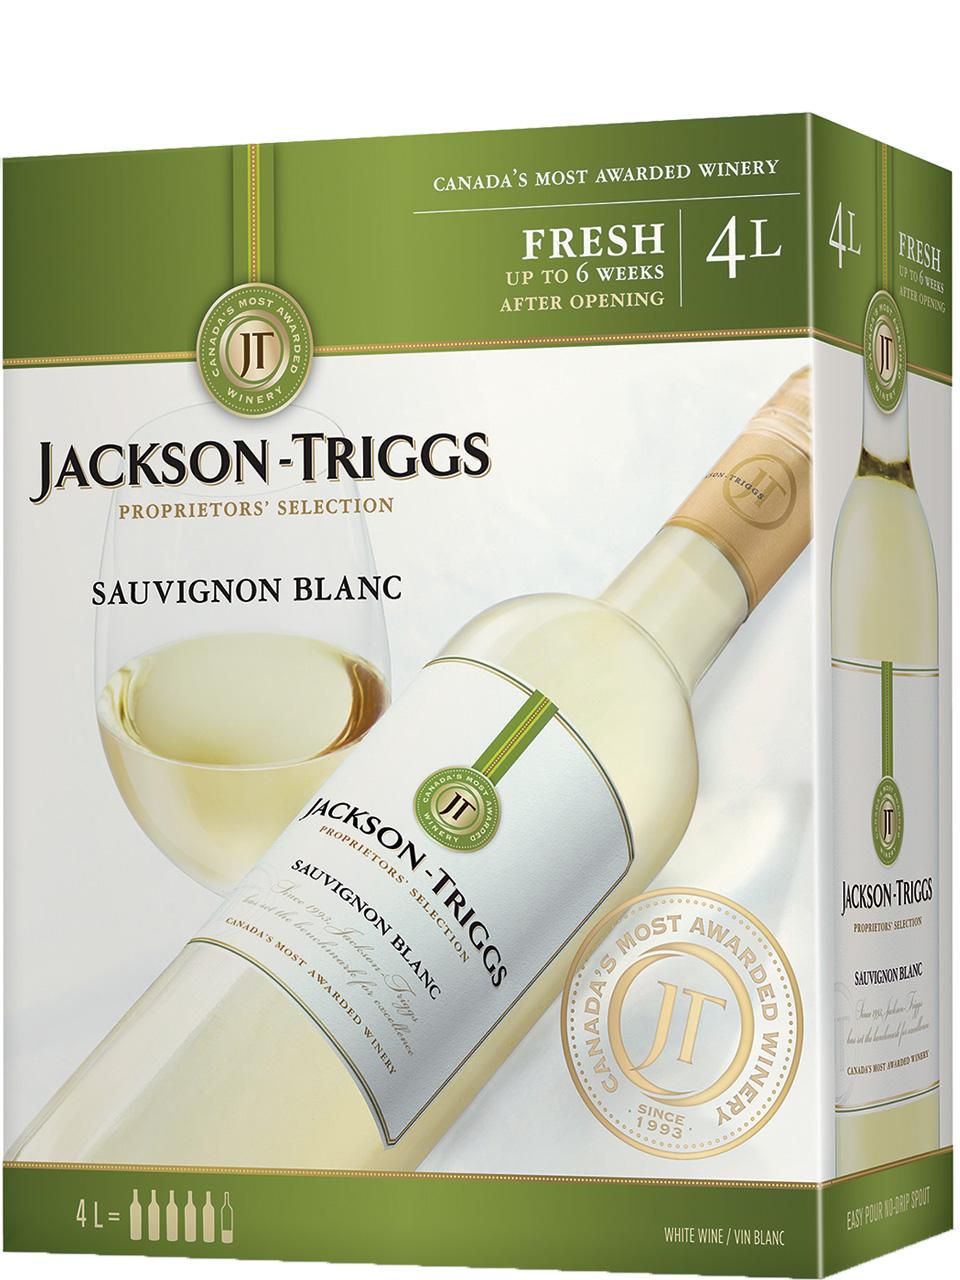 Jackson-Triggs Proprietors' Selection Sauvignon Bl